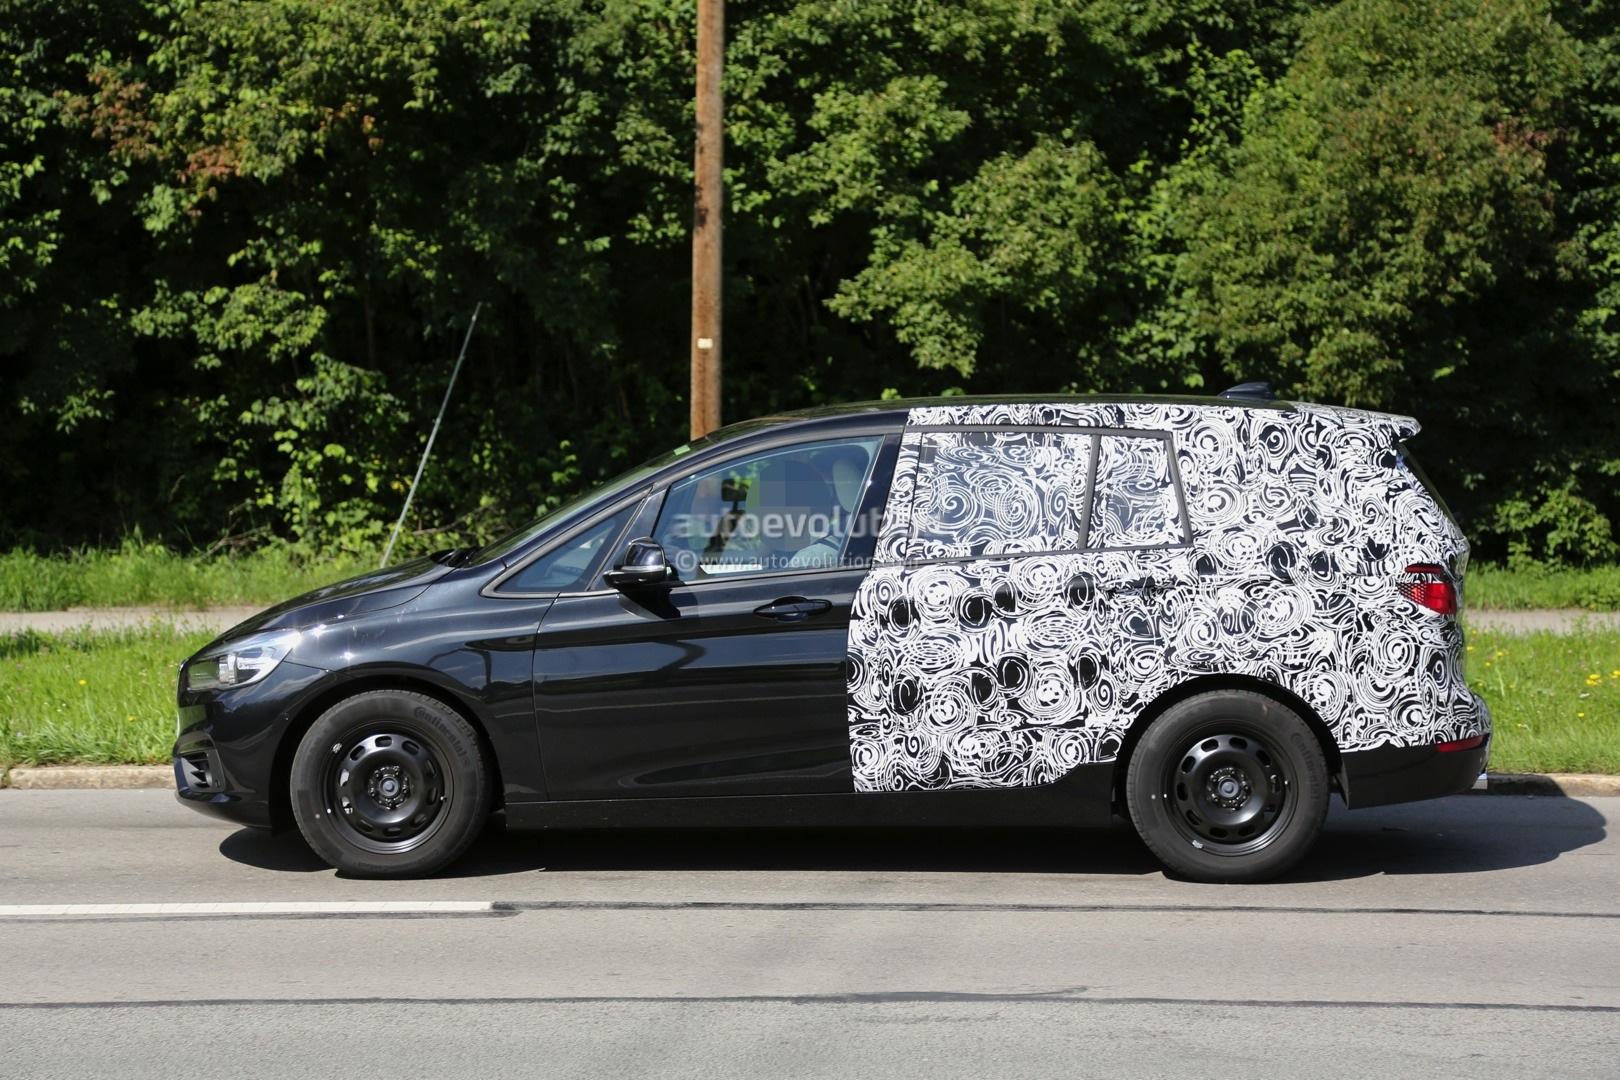 2015 bmw 2 series 7 seater spied half naked autoevolution. Black Bedroom Furniture Sets. Home Design Ideas